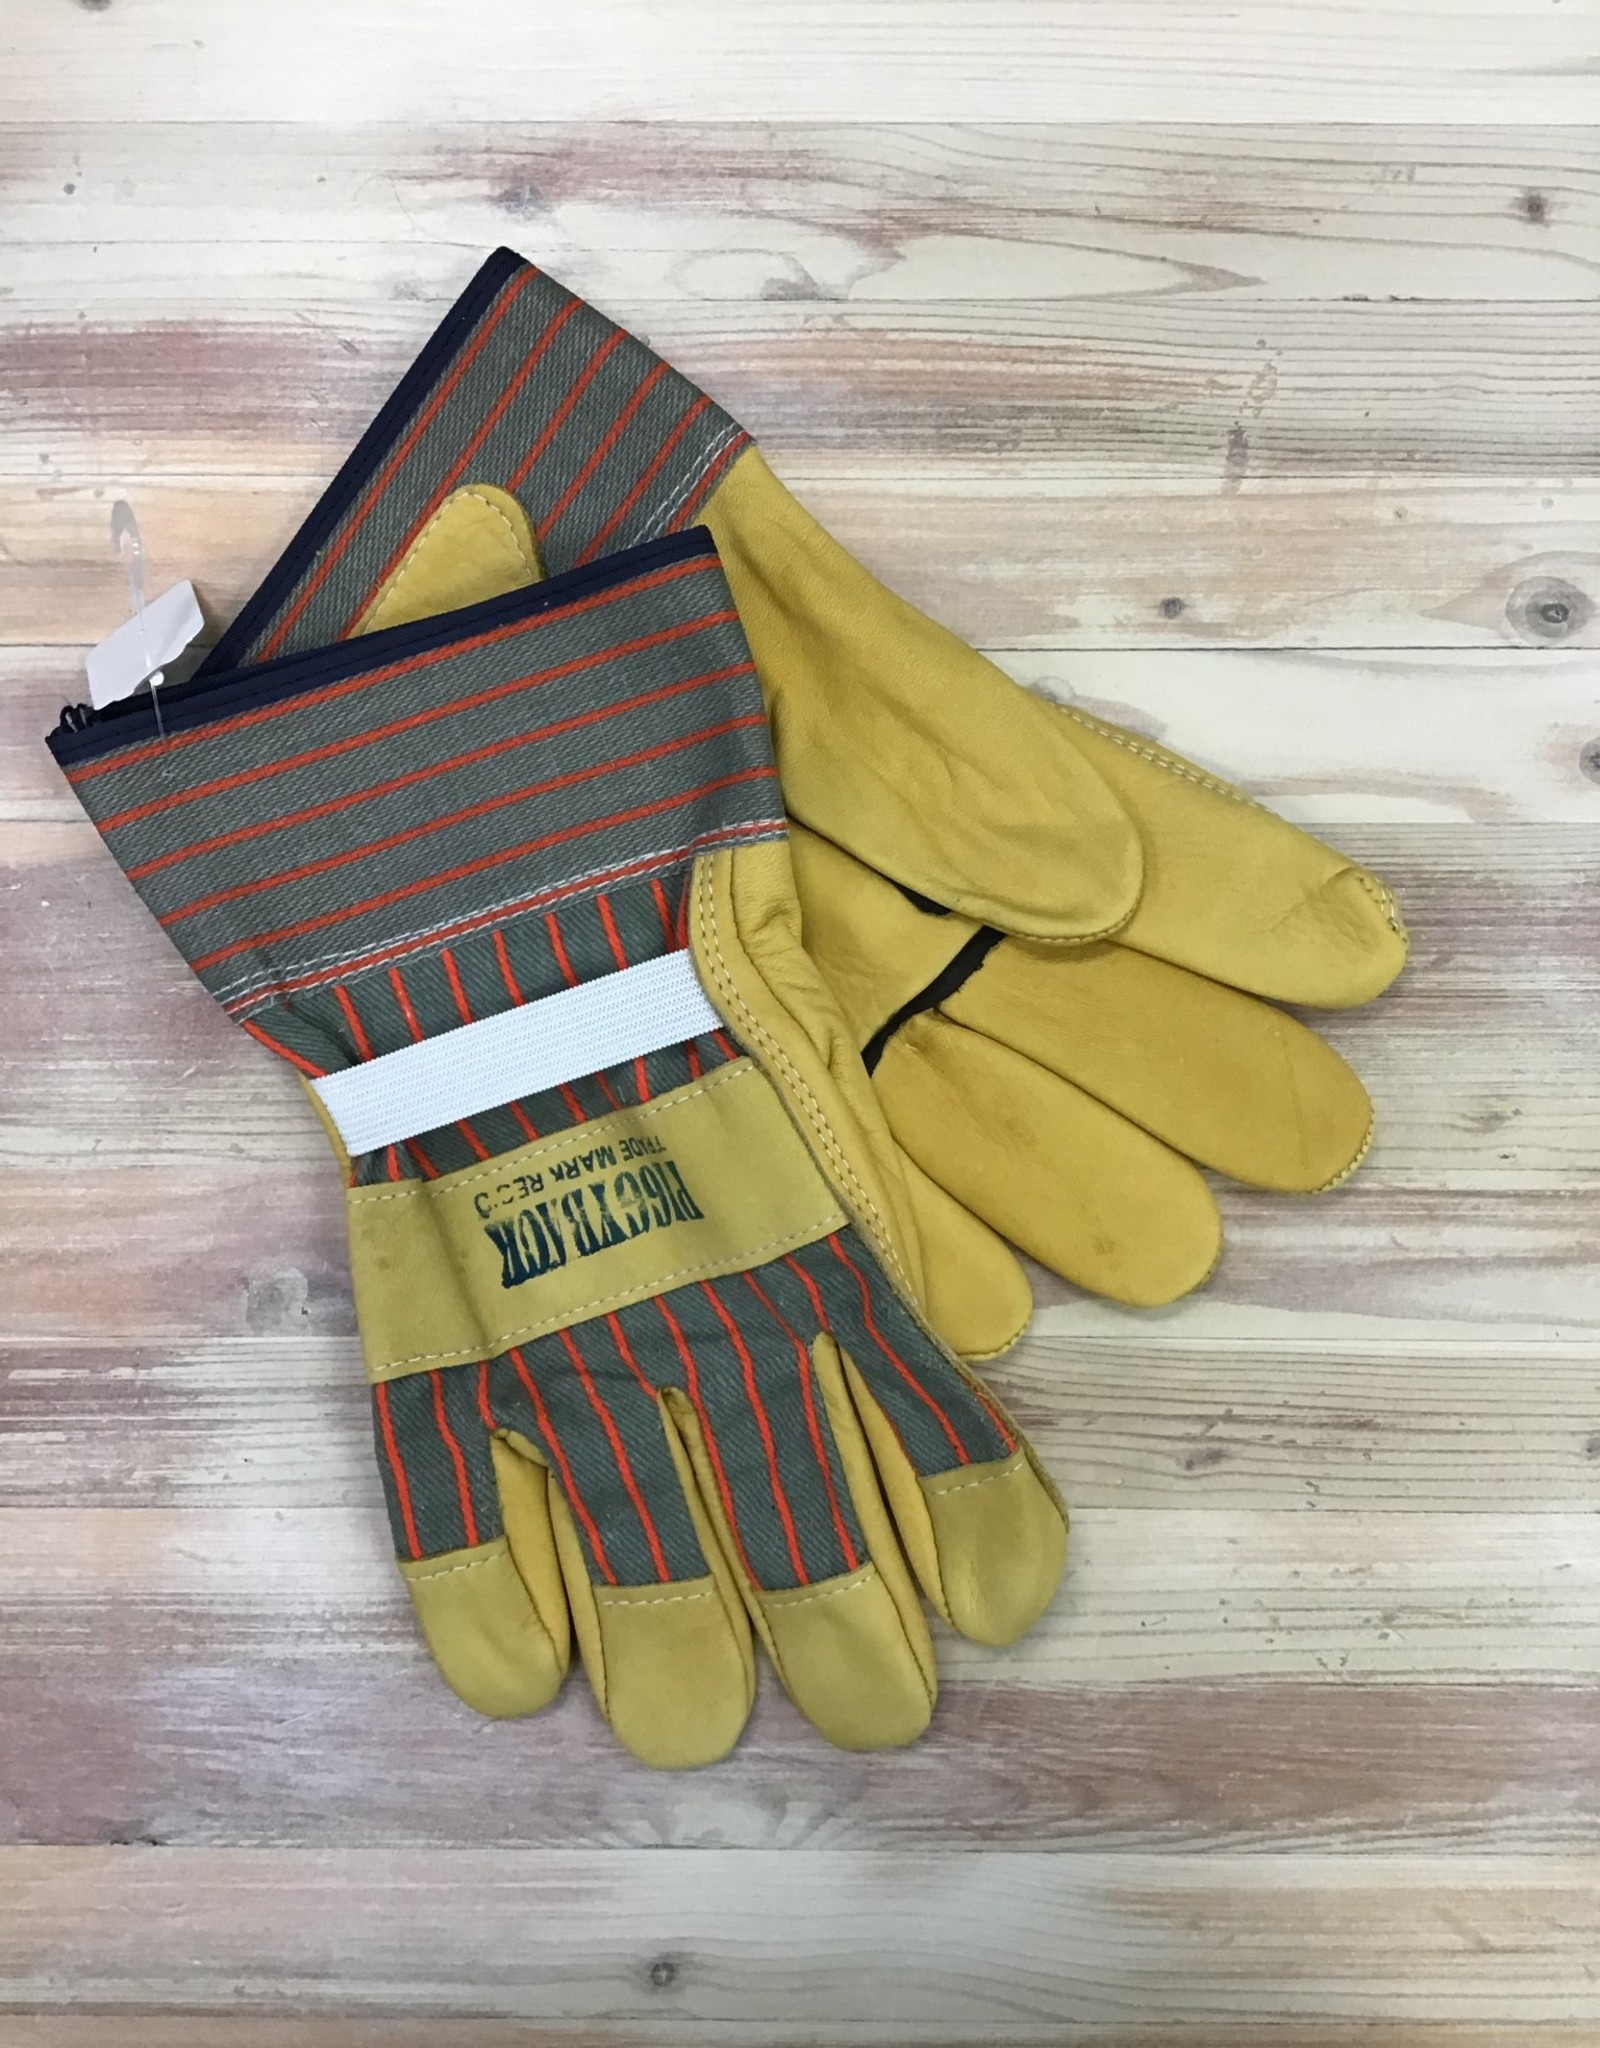 Piggy Back Piggy Back Leather Gloves Men's